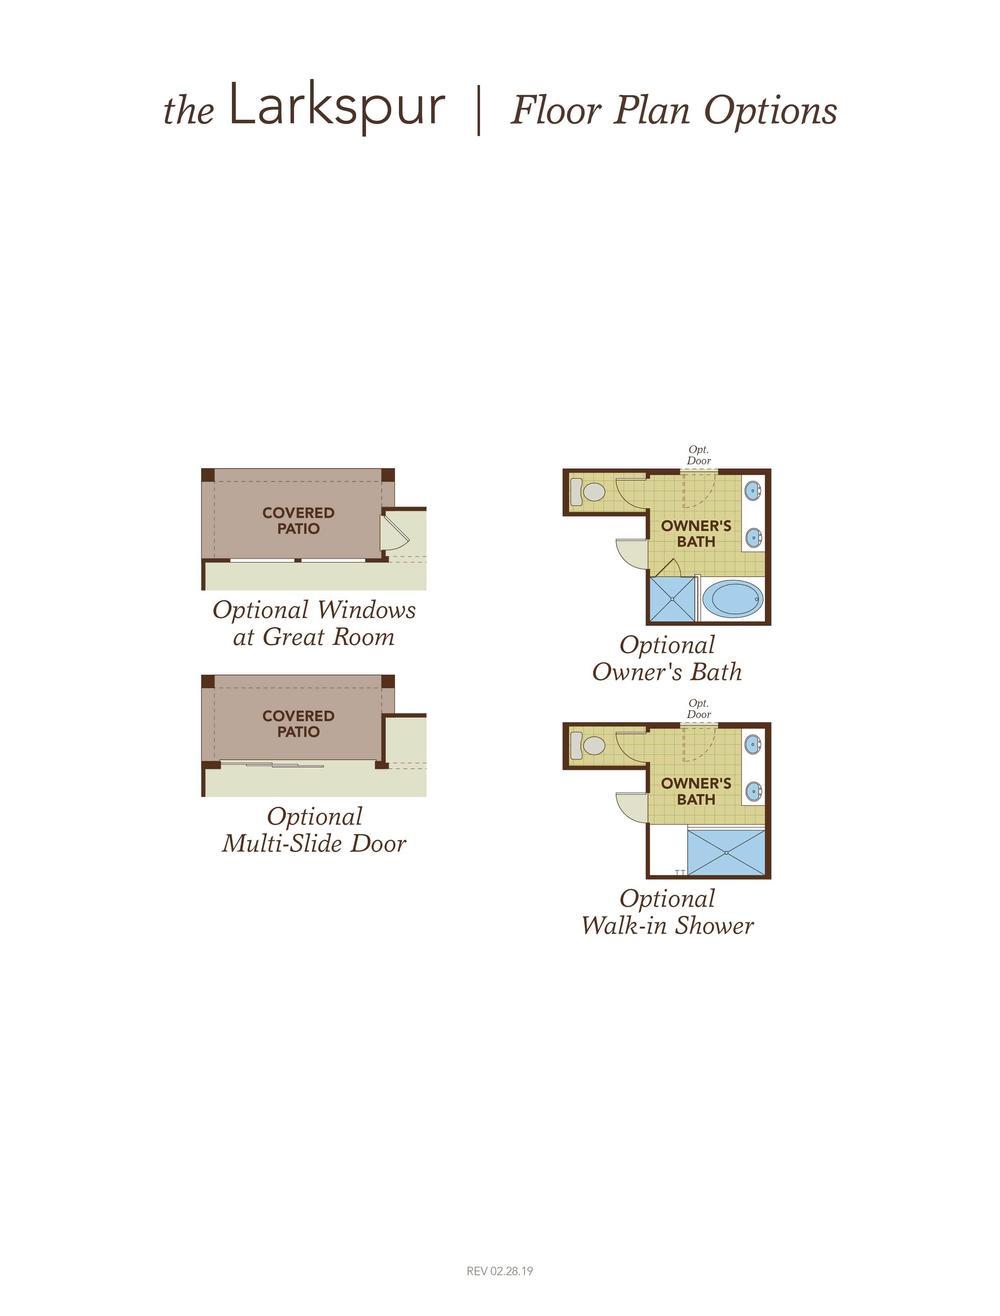 Larkspur Floor Plan Options